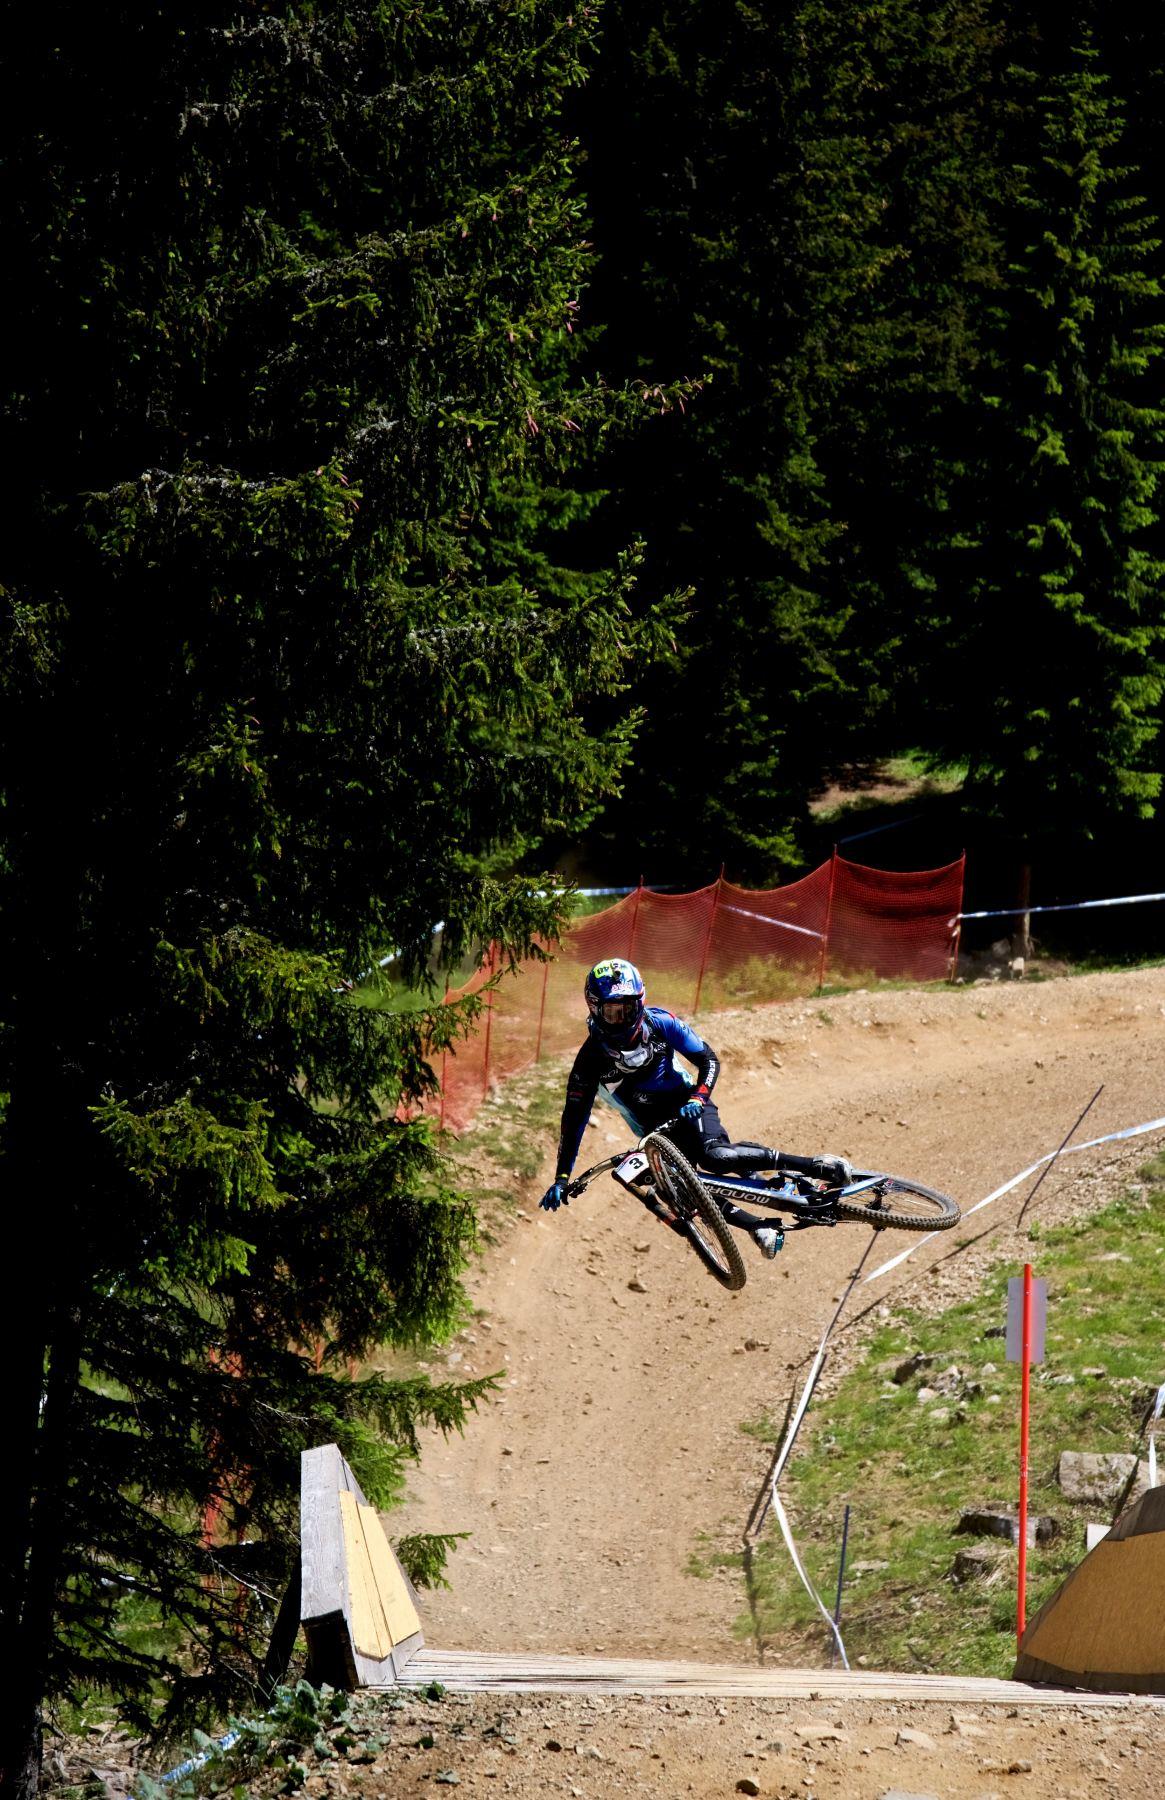 danny hart lenzerheide 2016 downhill uci worldcup